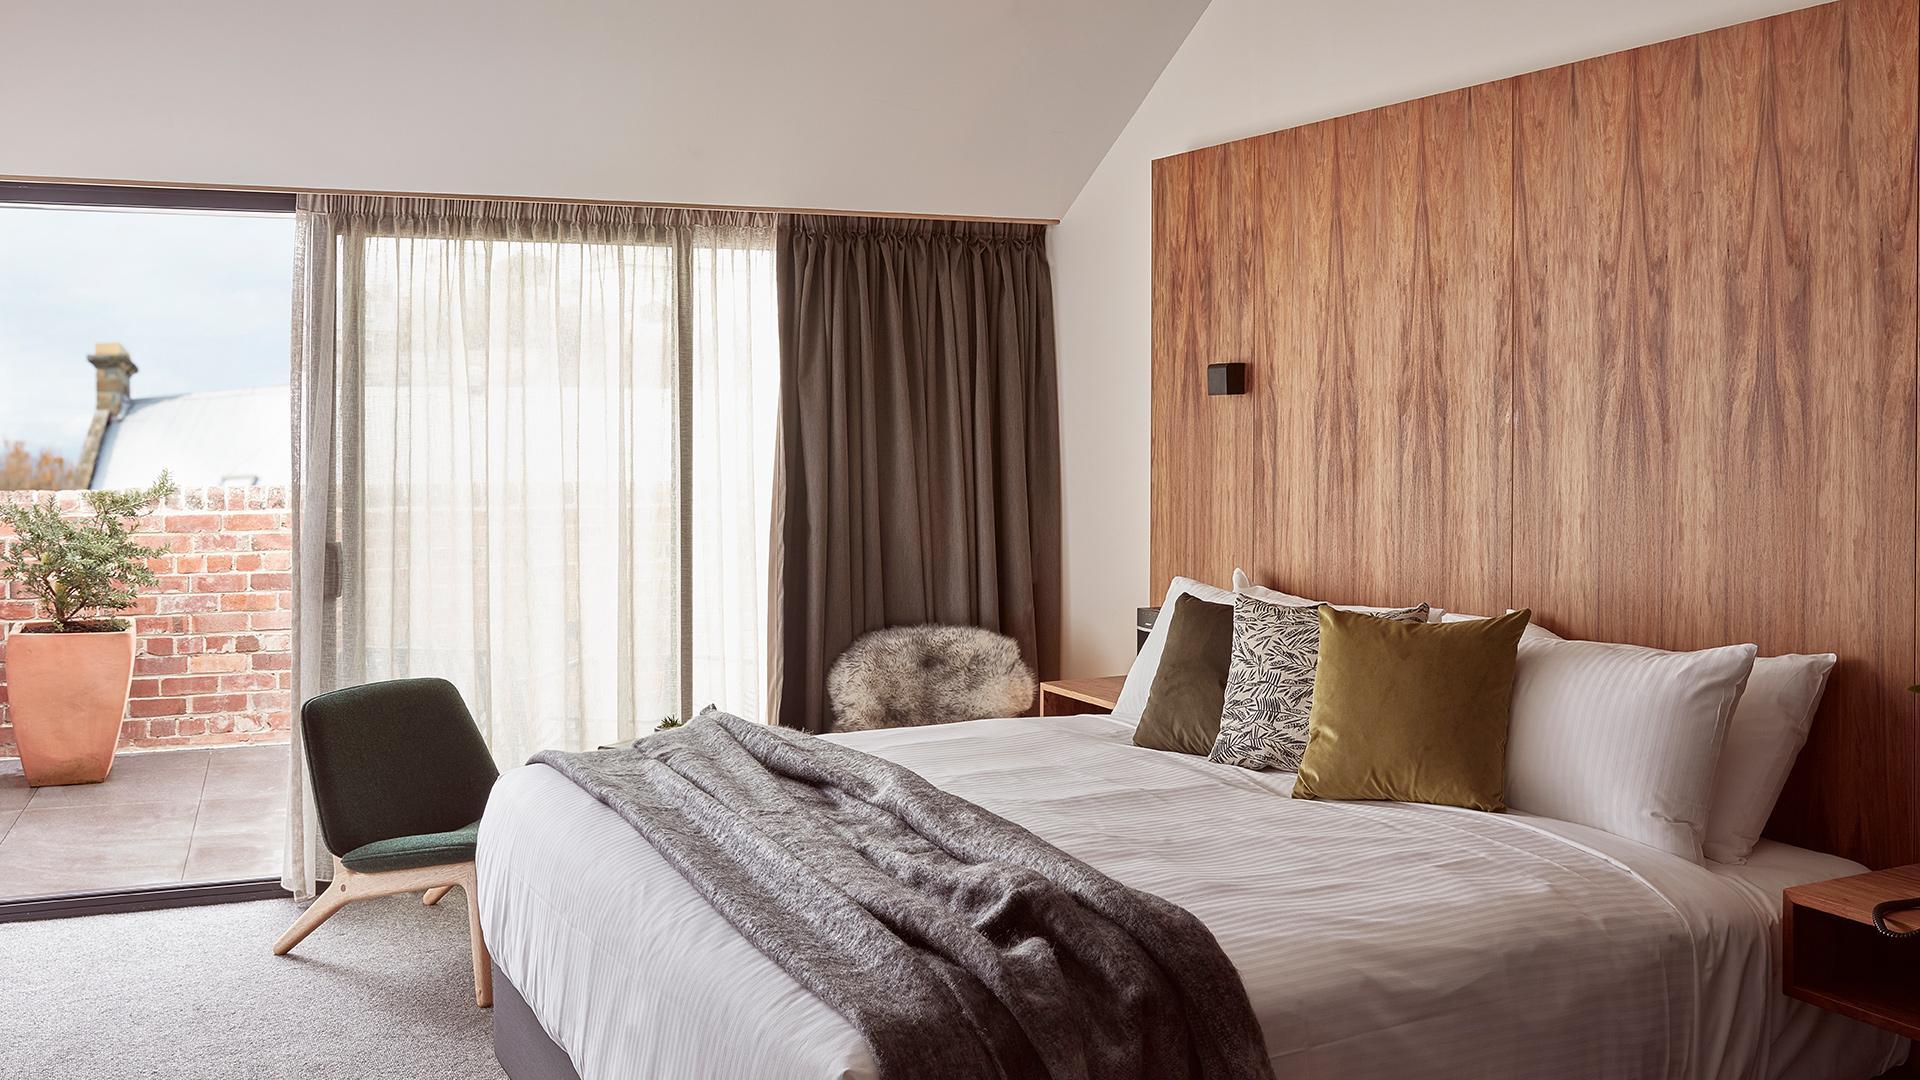 Superior King Room - Grove Balcony - Feb 20 image 1 at Moss Hotel by Hobart City Council, Tasmania, Australia